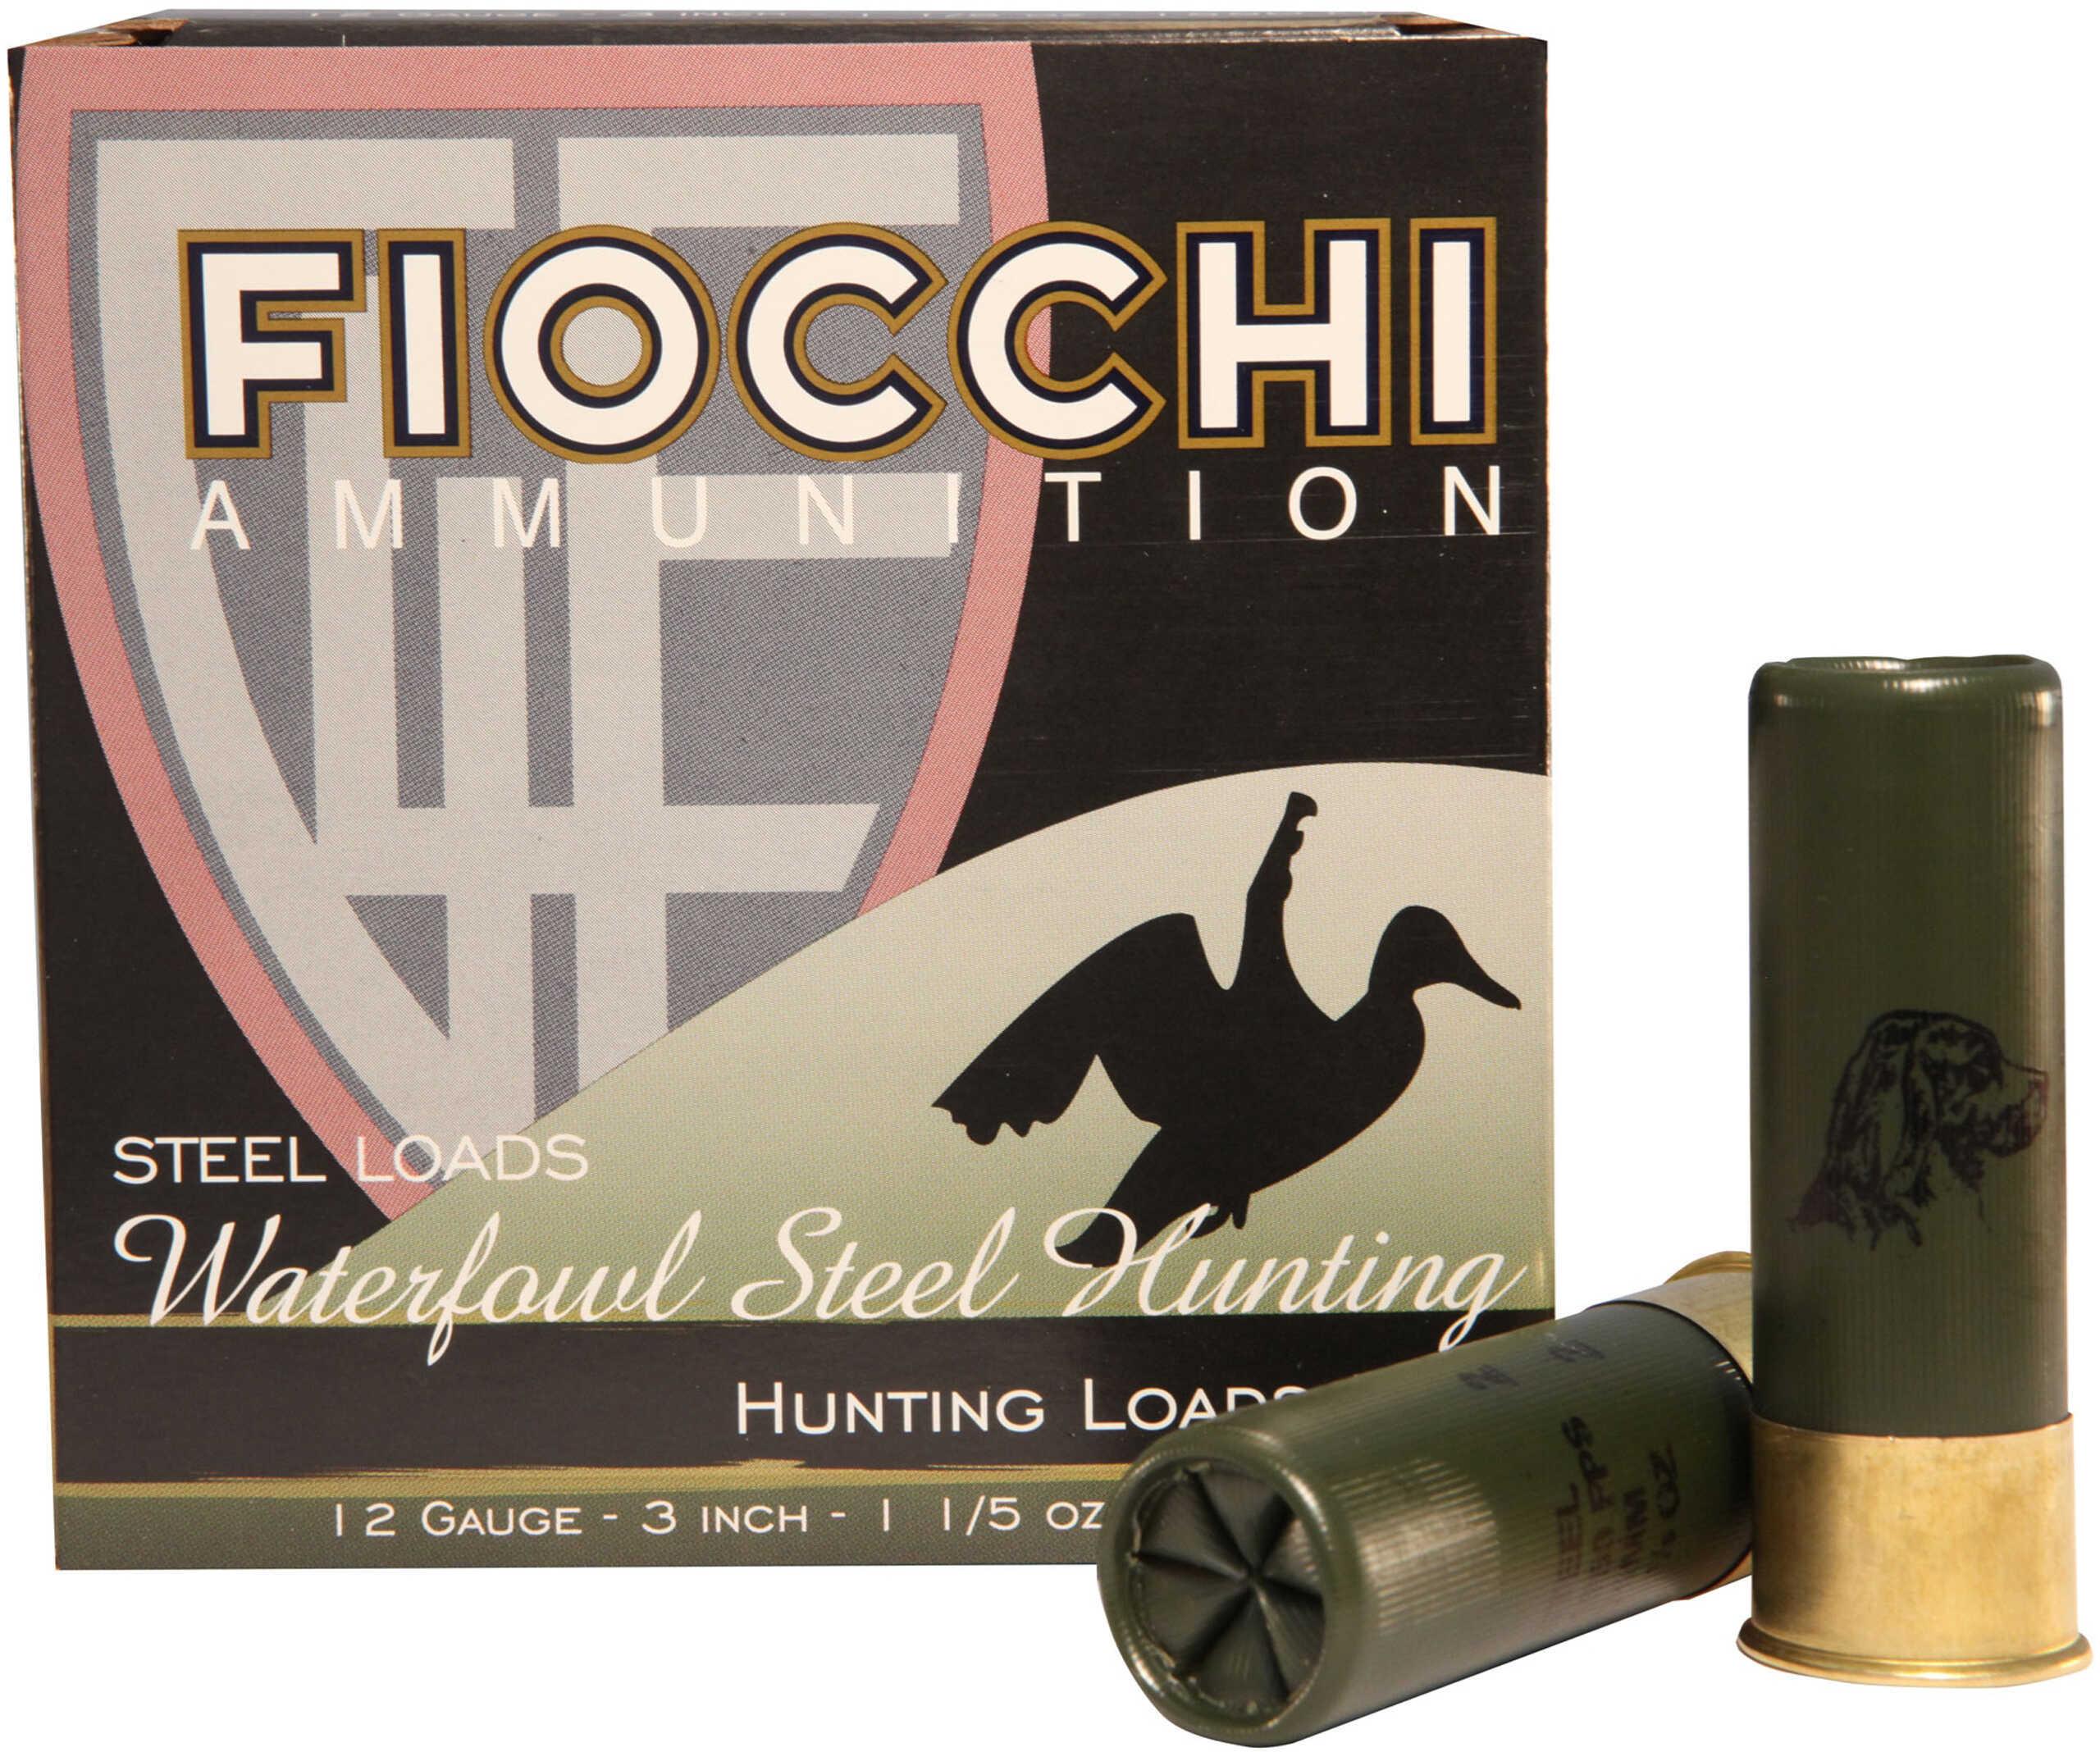 Fiocchi Speed Steel 12 Gauge 3 Inch 1-1/5 Ounce #2 Shot Shotshells, 25 Rounds Per Box